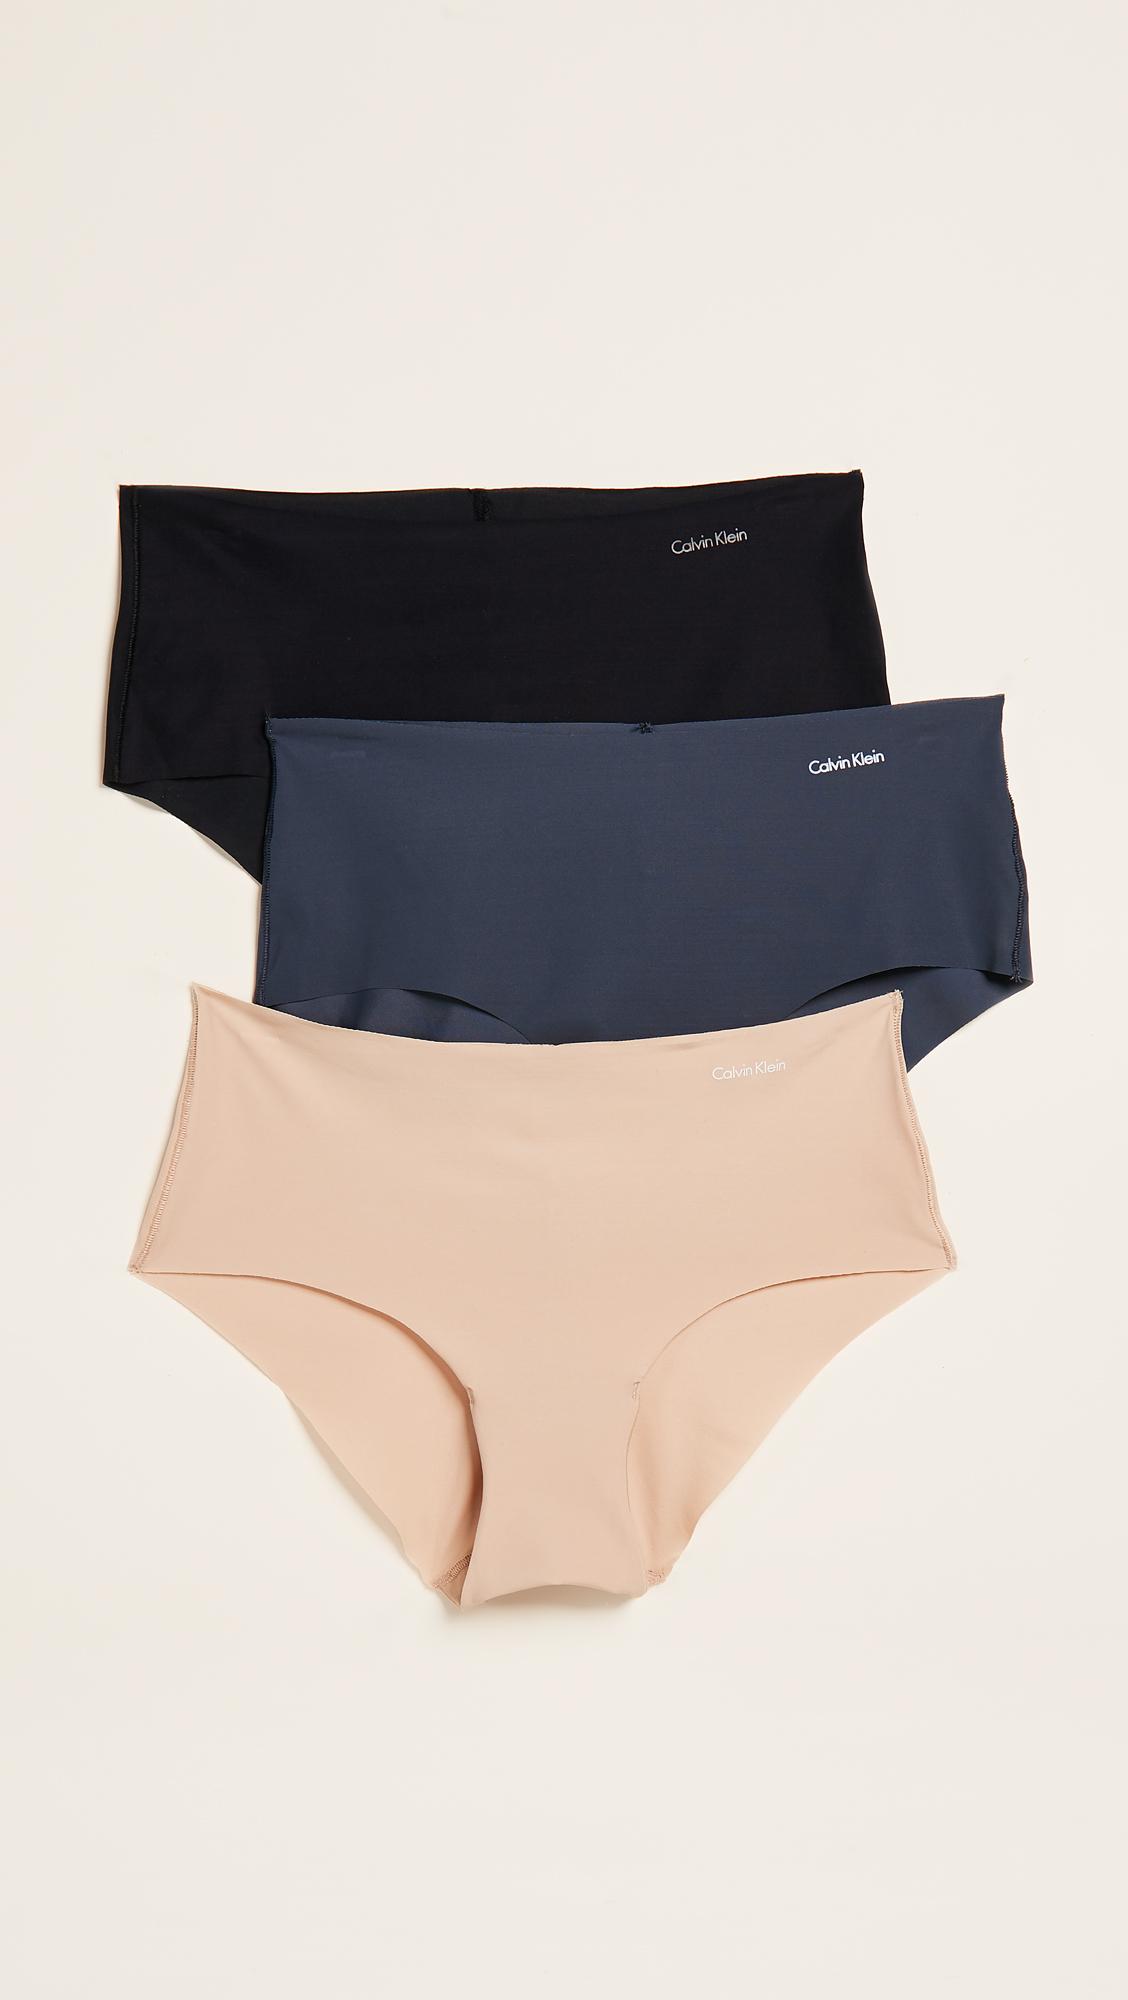 78d2218a39d018 Calvin Klein Underwear Invisibles Hipster 3 Pack | SHOPBOP